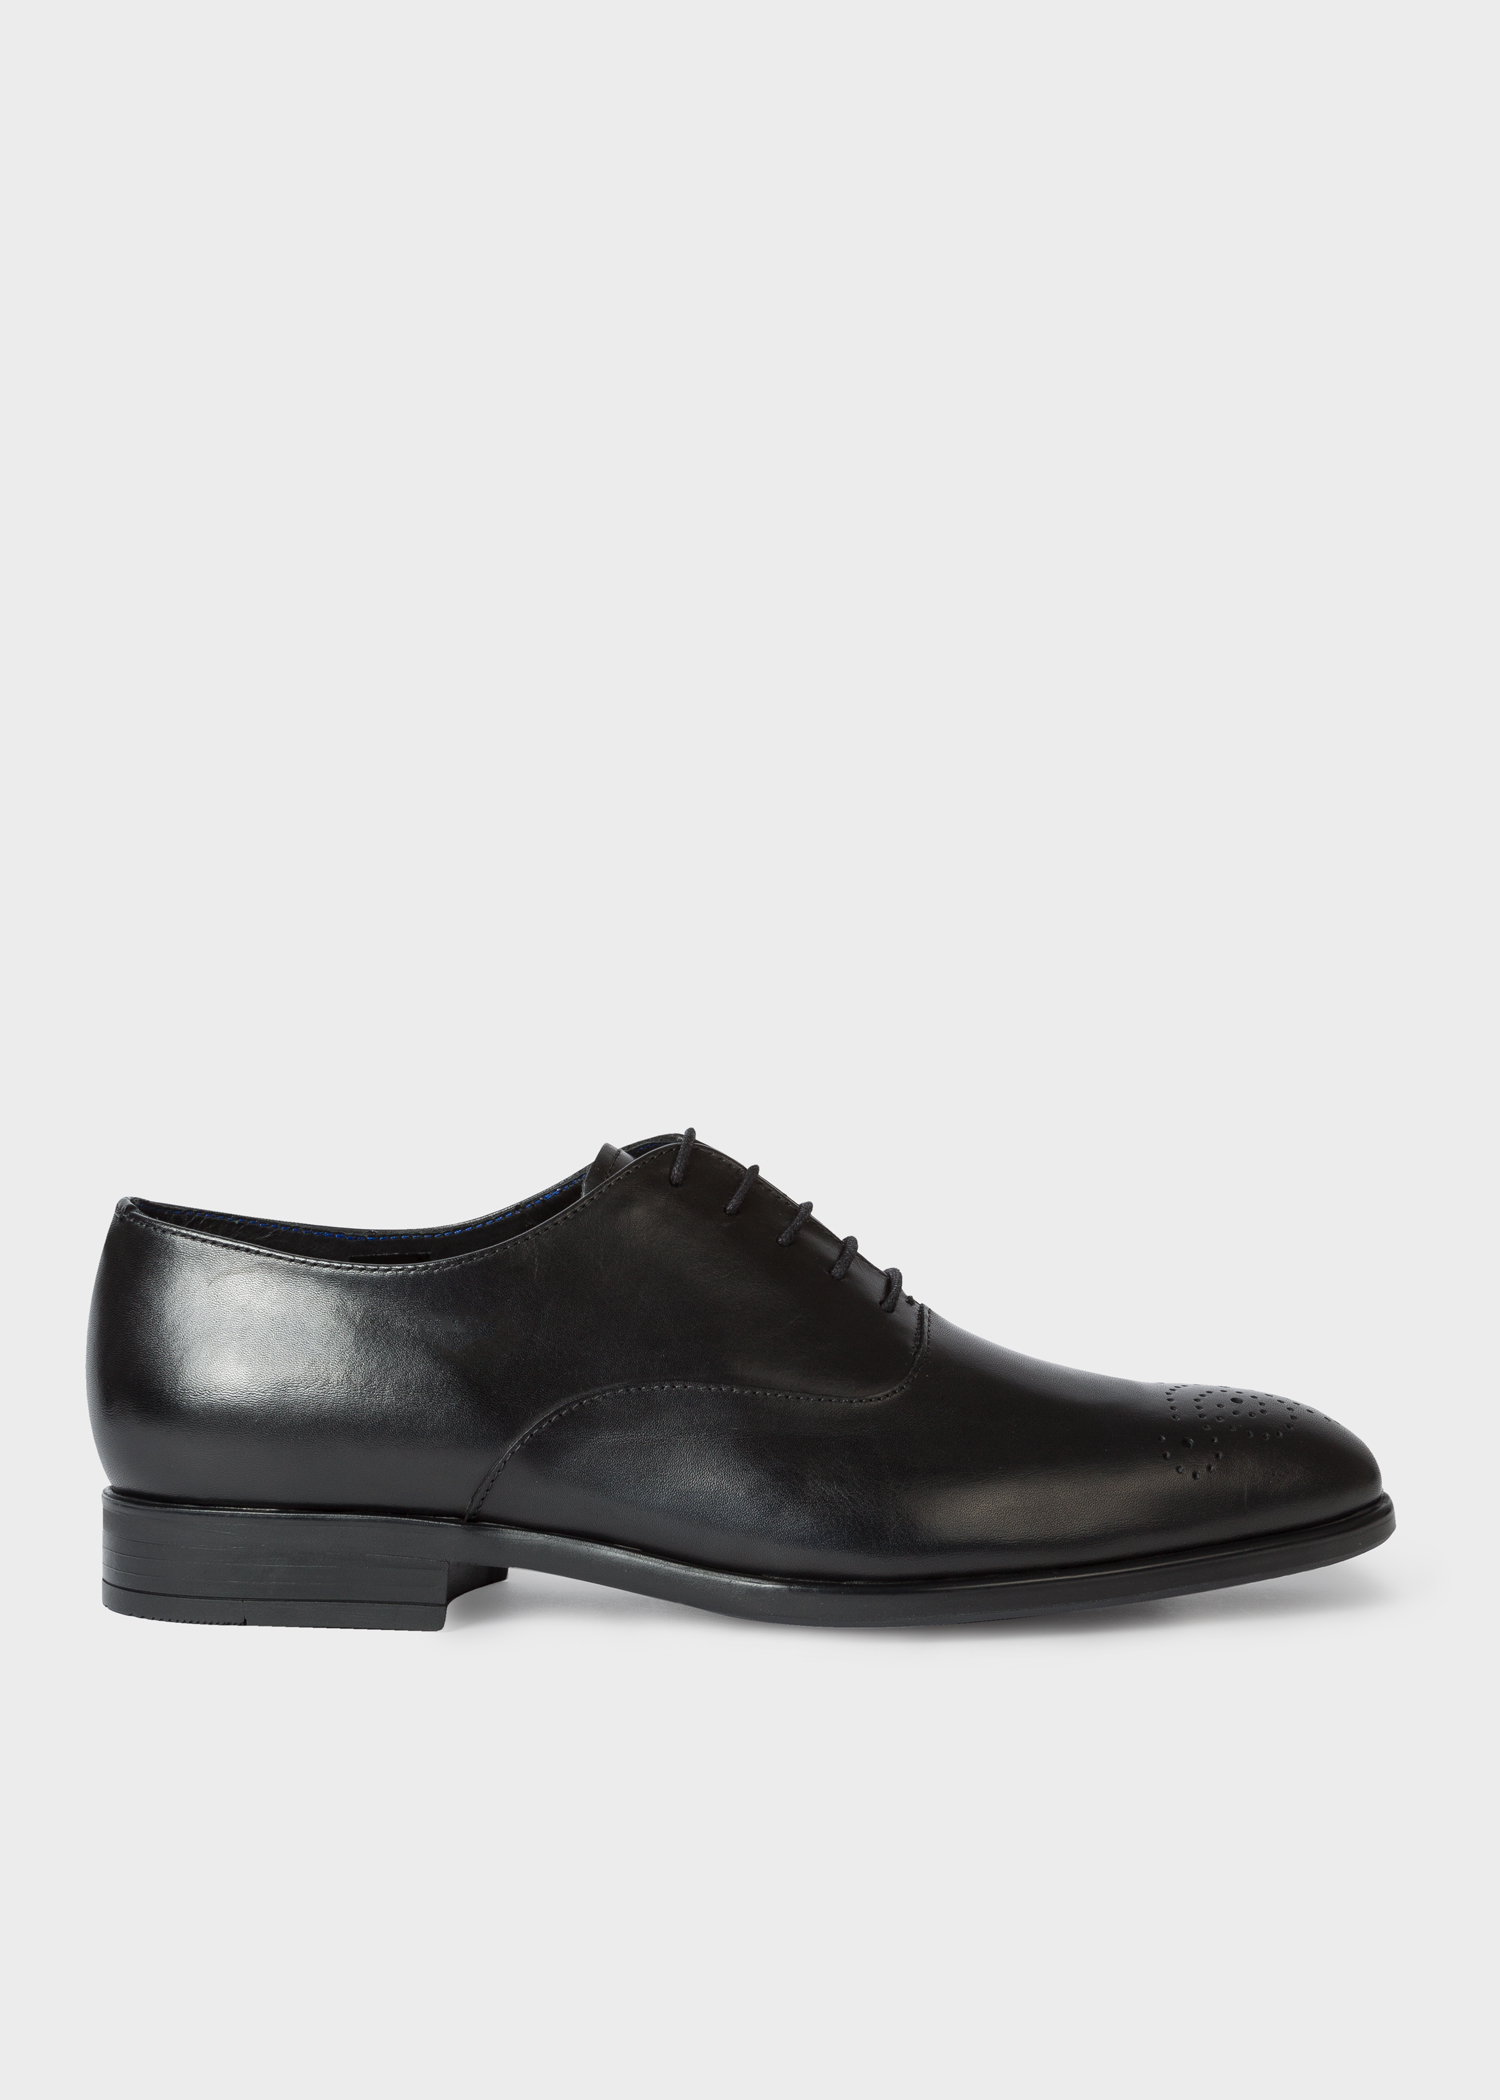 Oxford Cuir 'guy' Chaussures Homme Noires En 4cj35ARLq